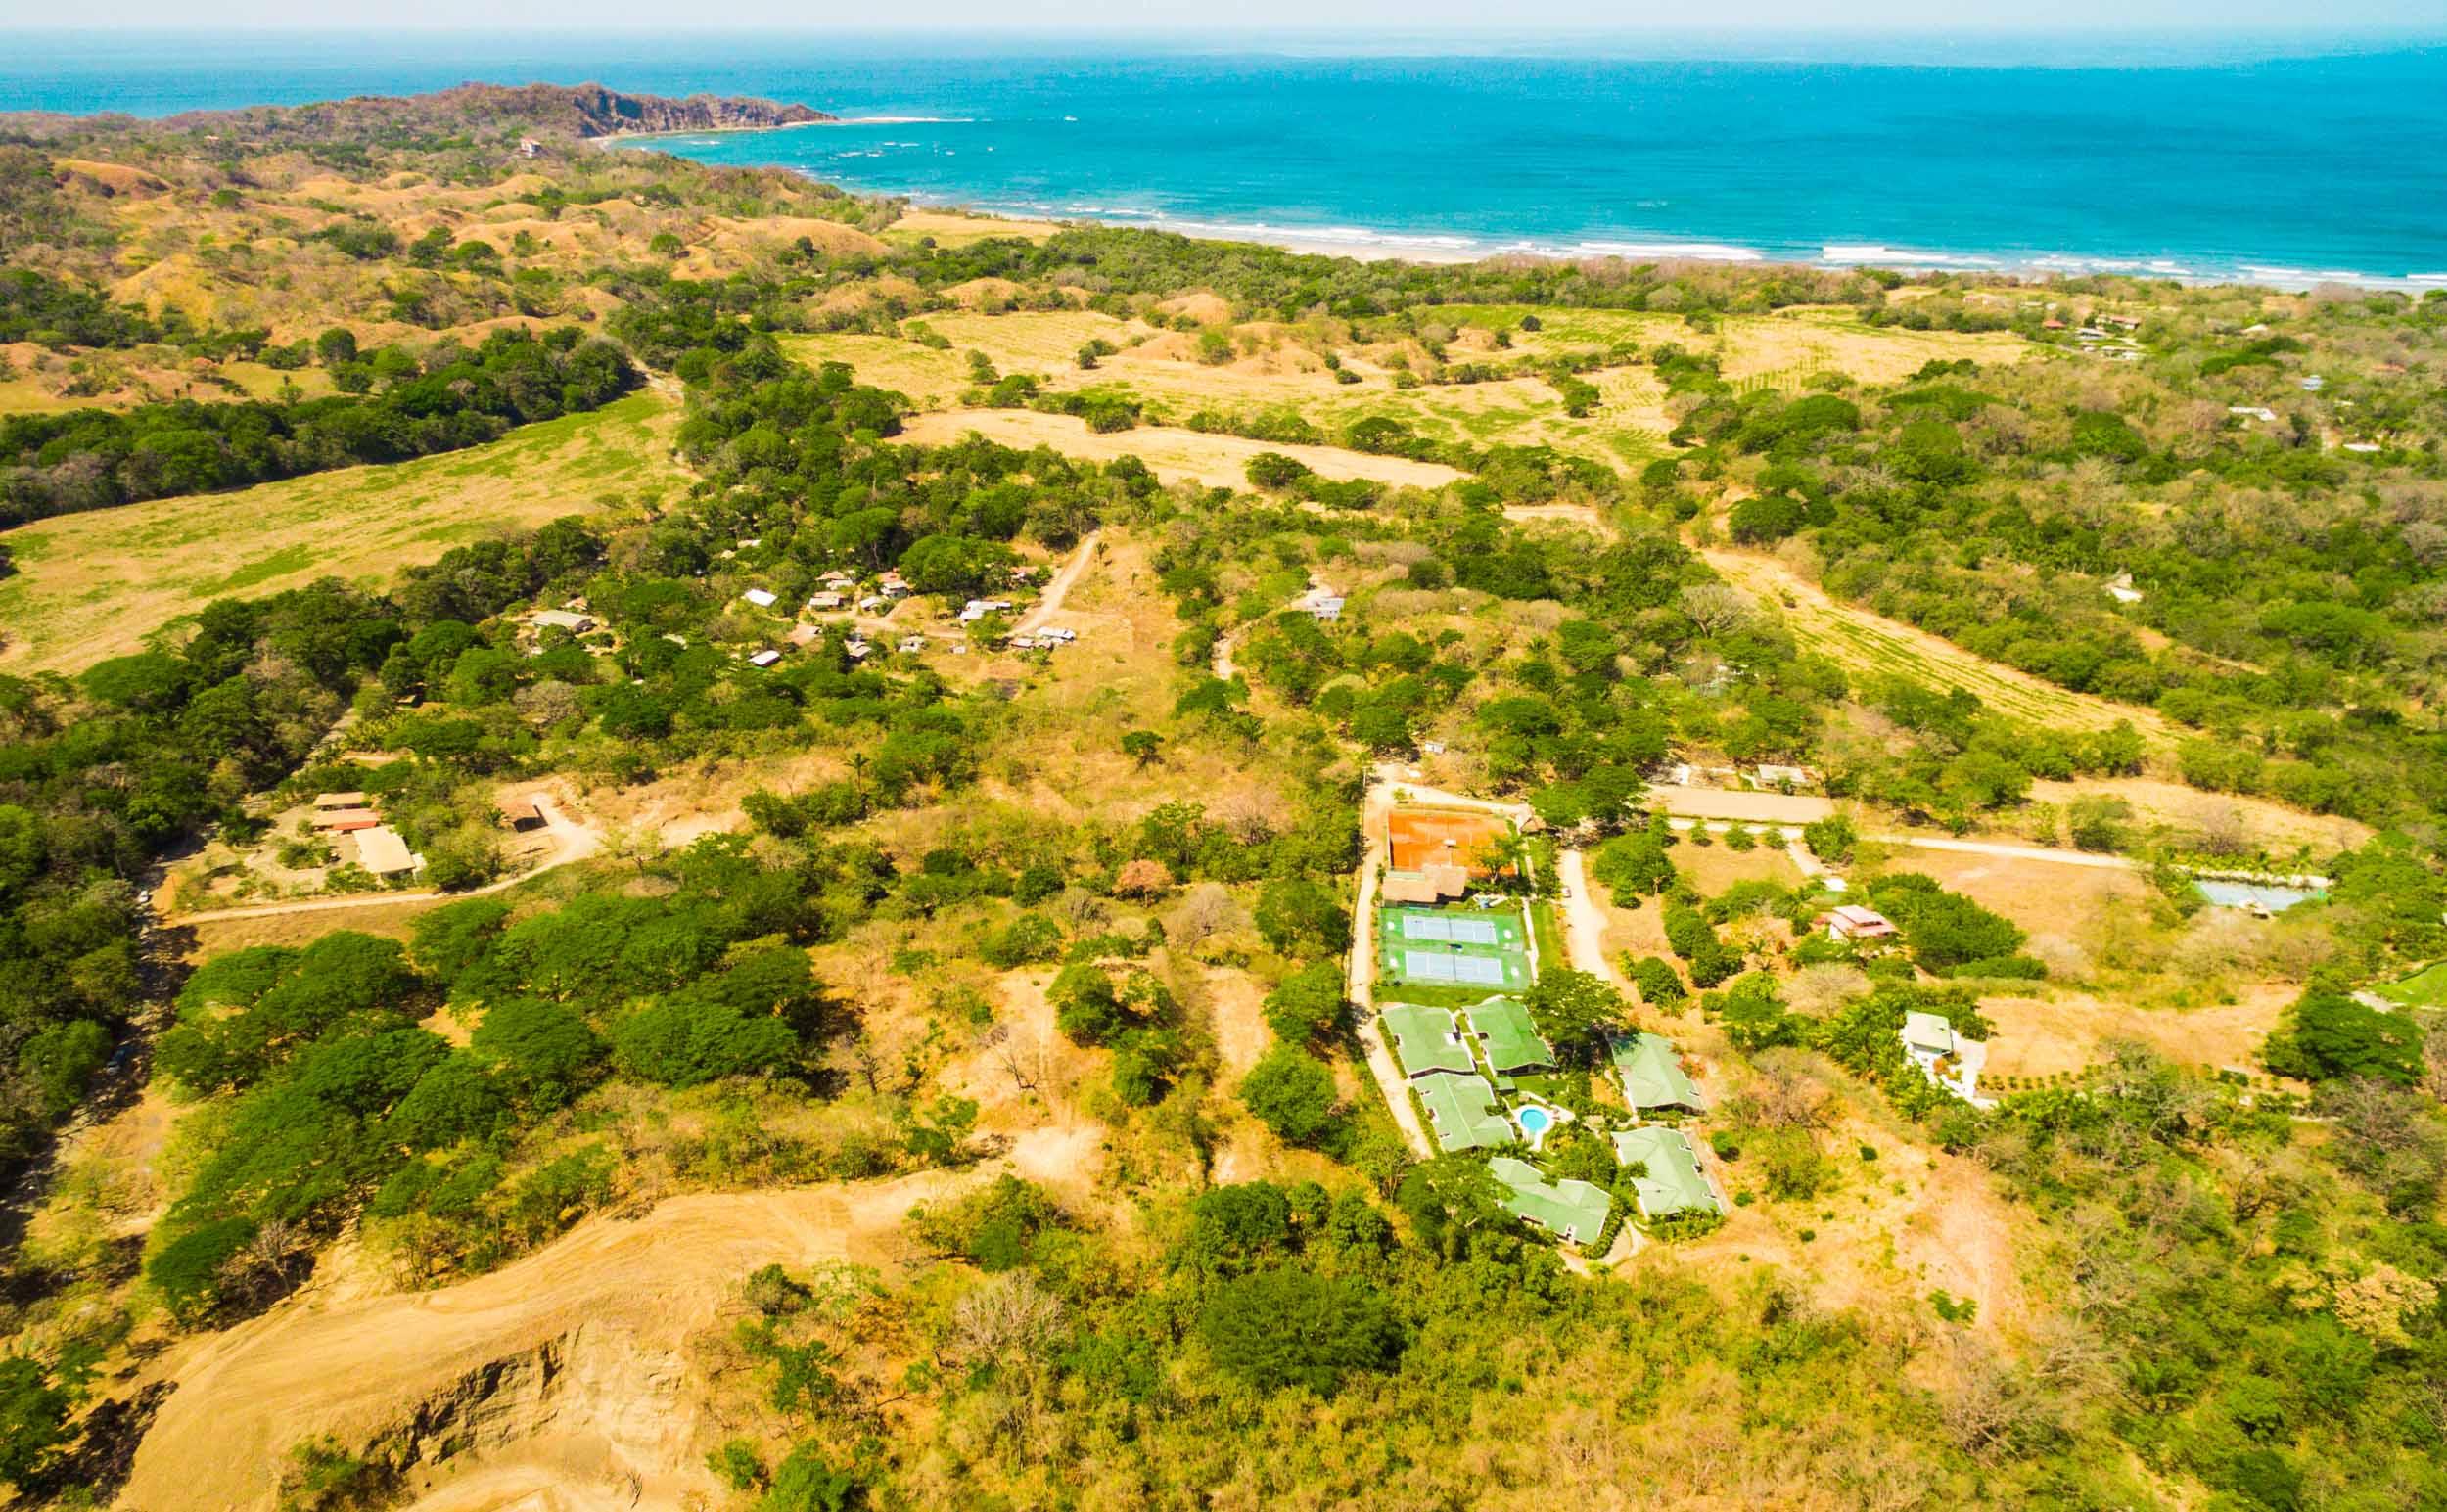 Finca-España-Wanderlust-Realty-Real-Estate-Nosara-Costa-Rica-1.jpg